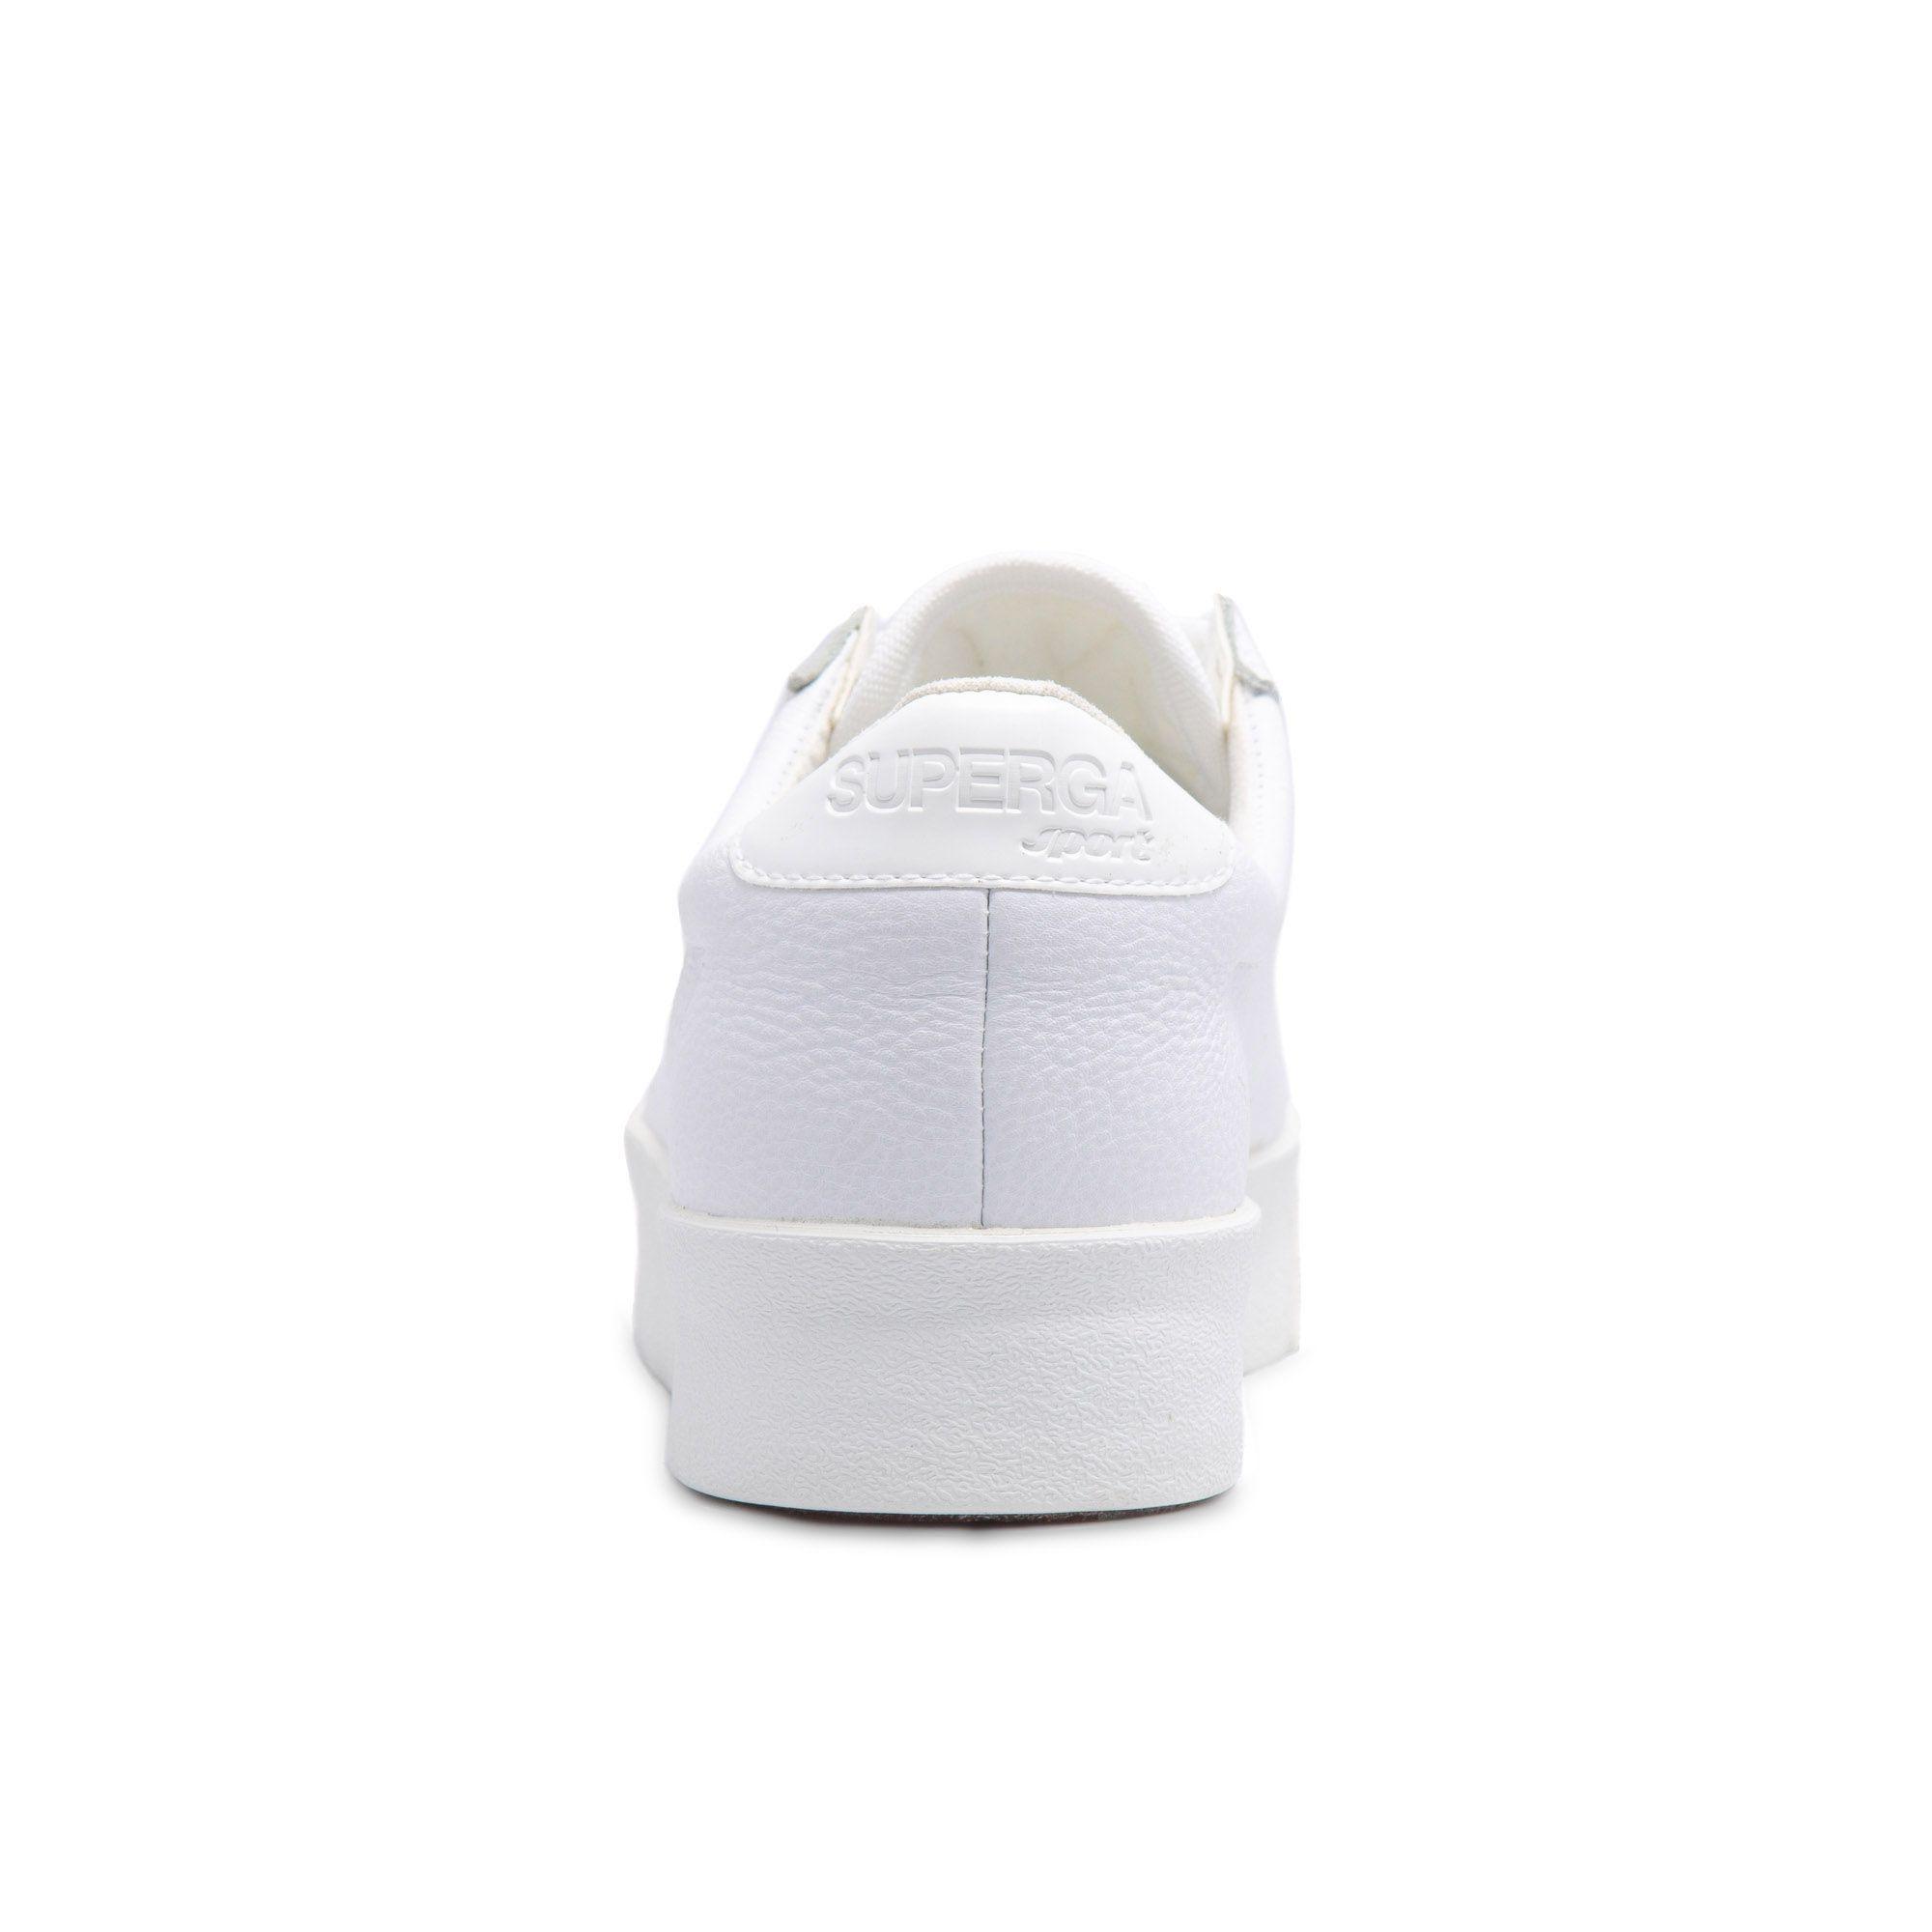 2854 CLUB 3 LEAW WHITE